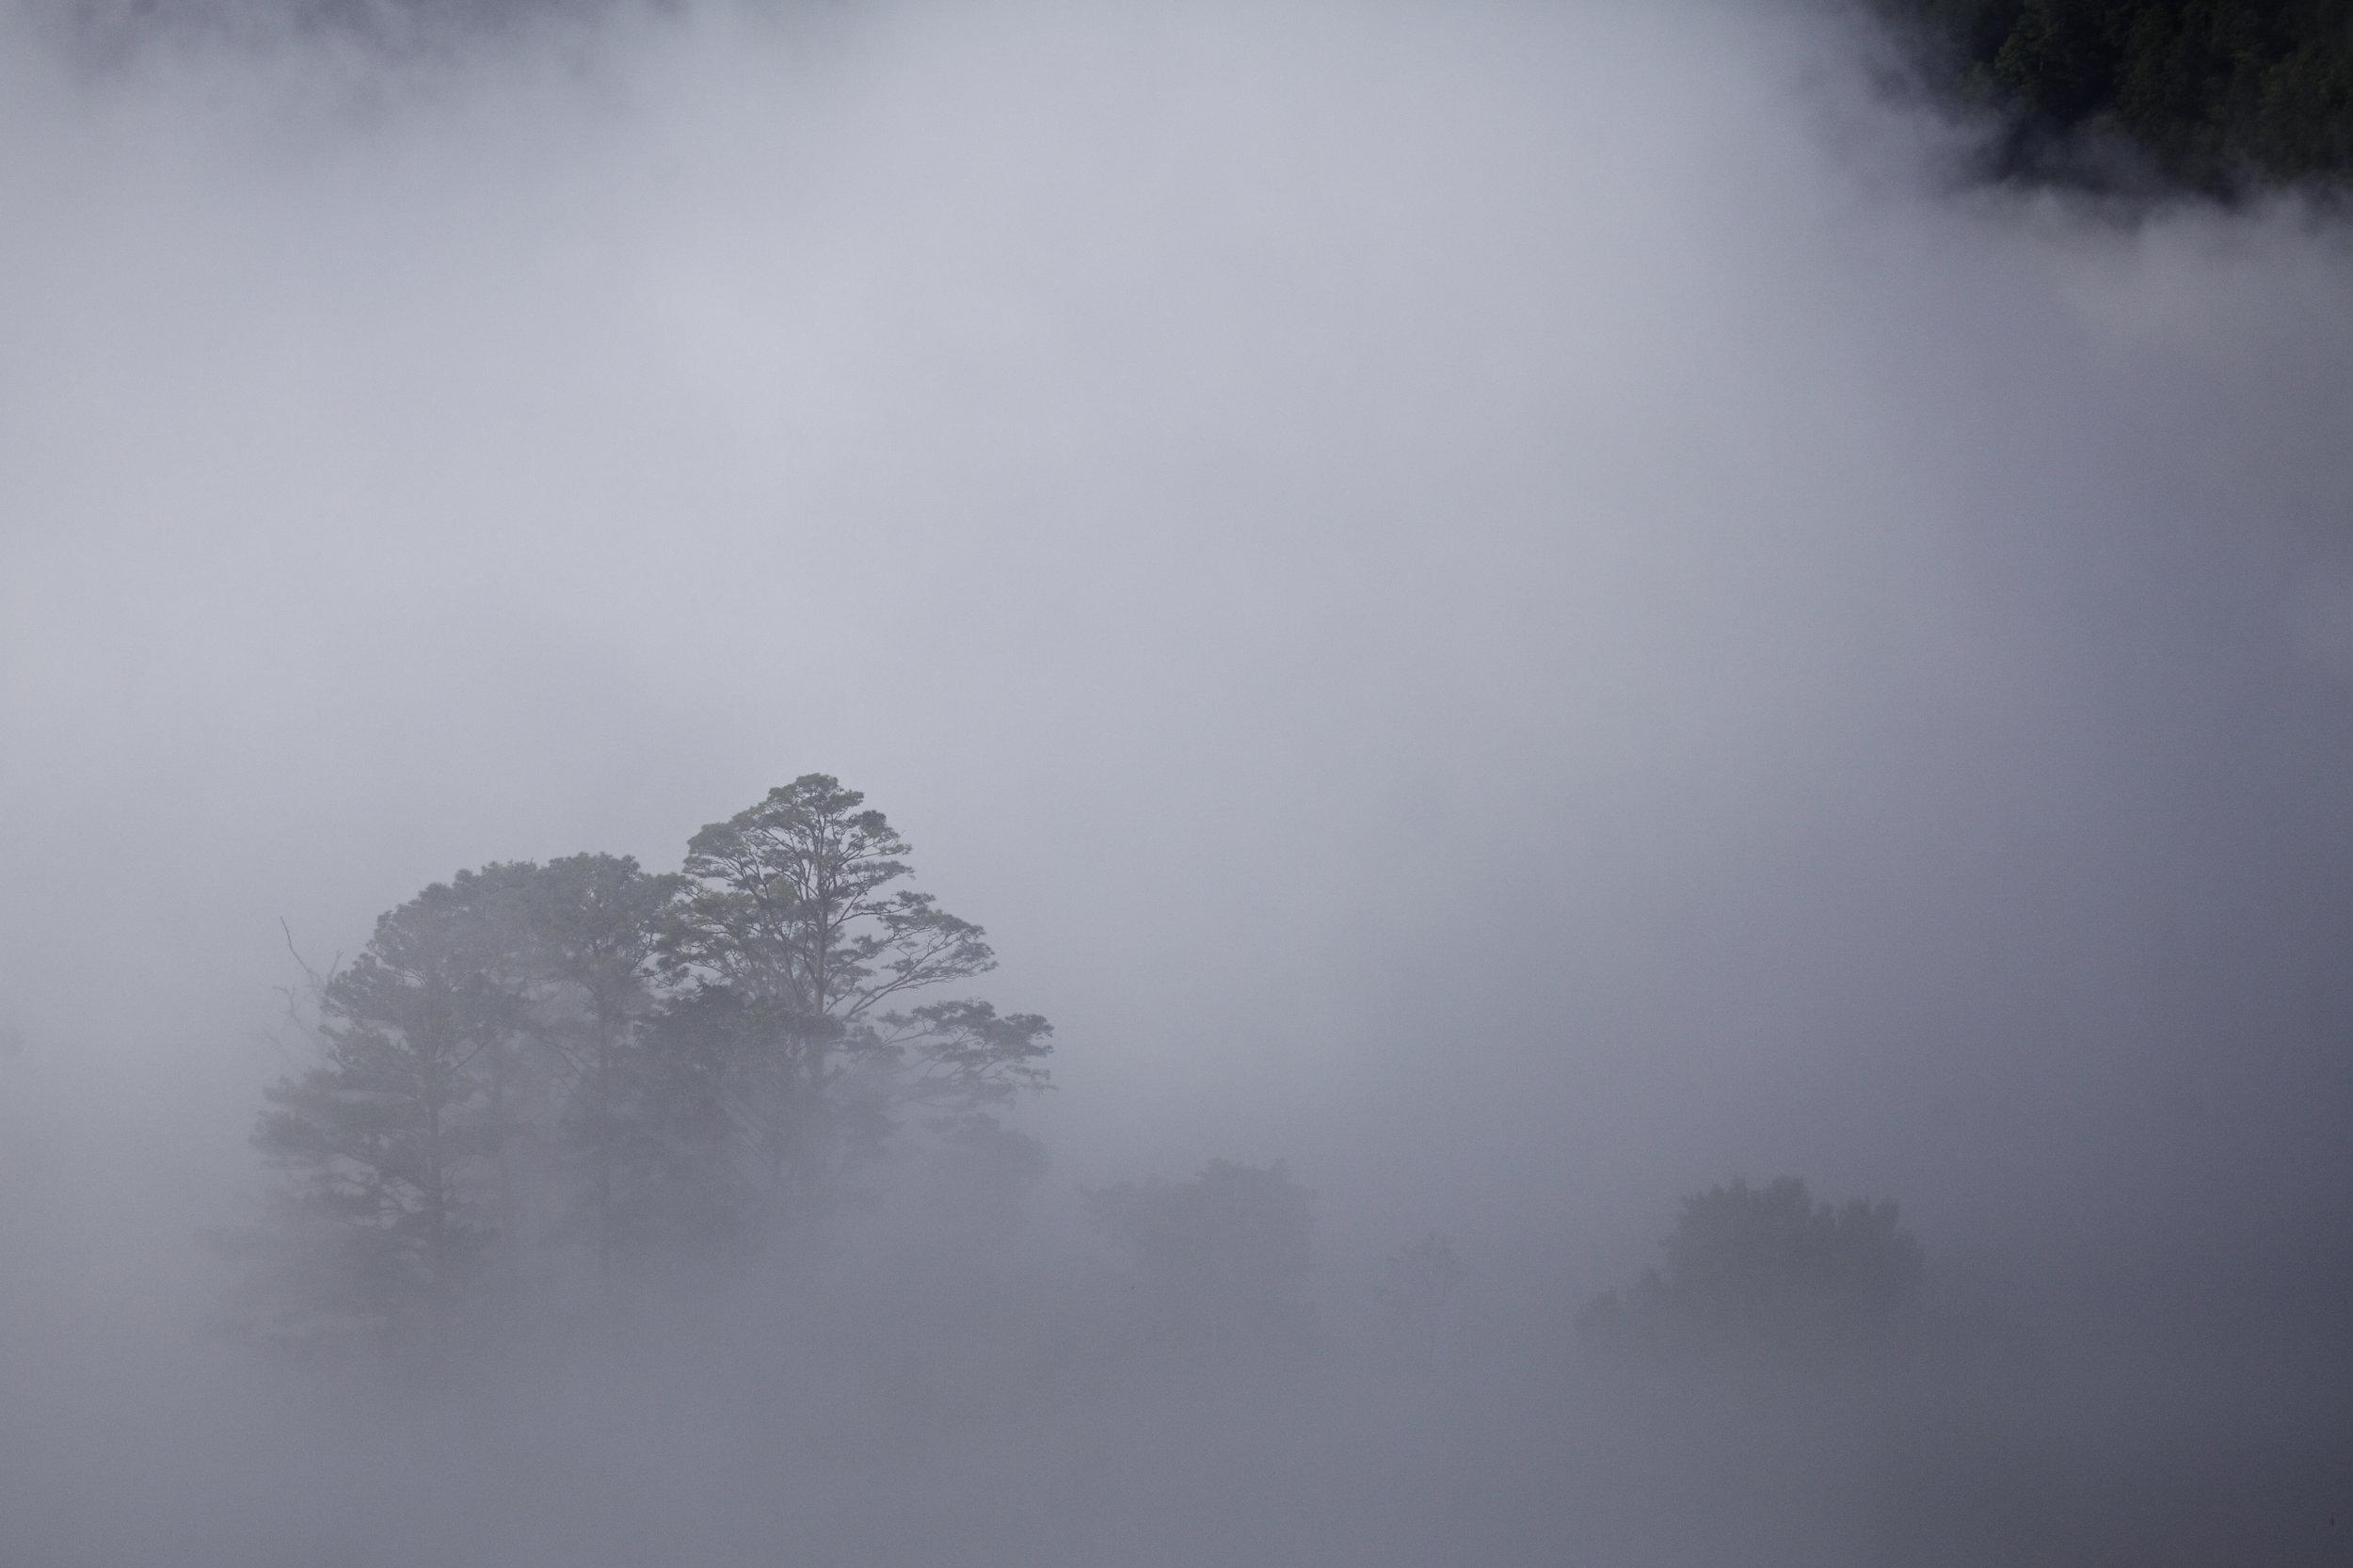 Opwall - Honduras 2014 © Benjamin Sadd 6930.jpg